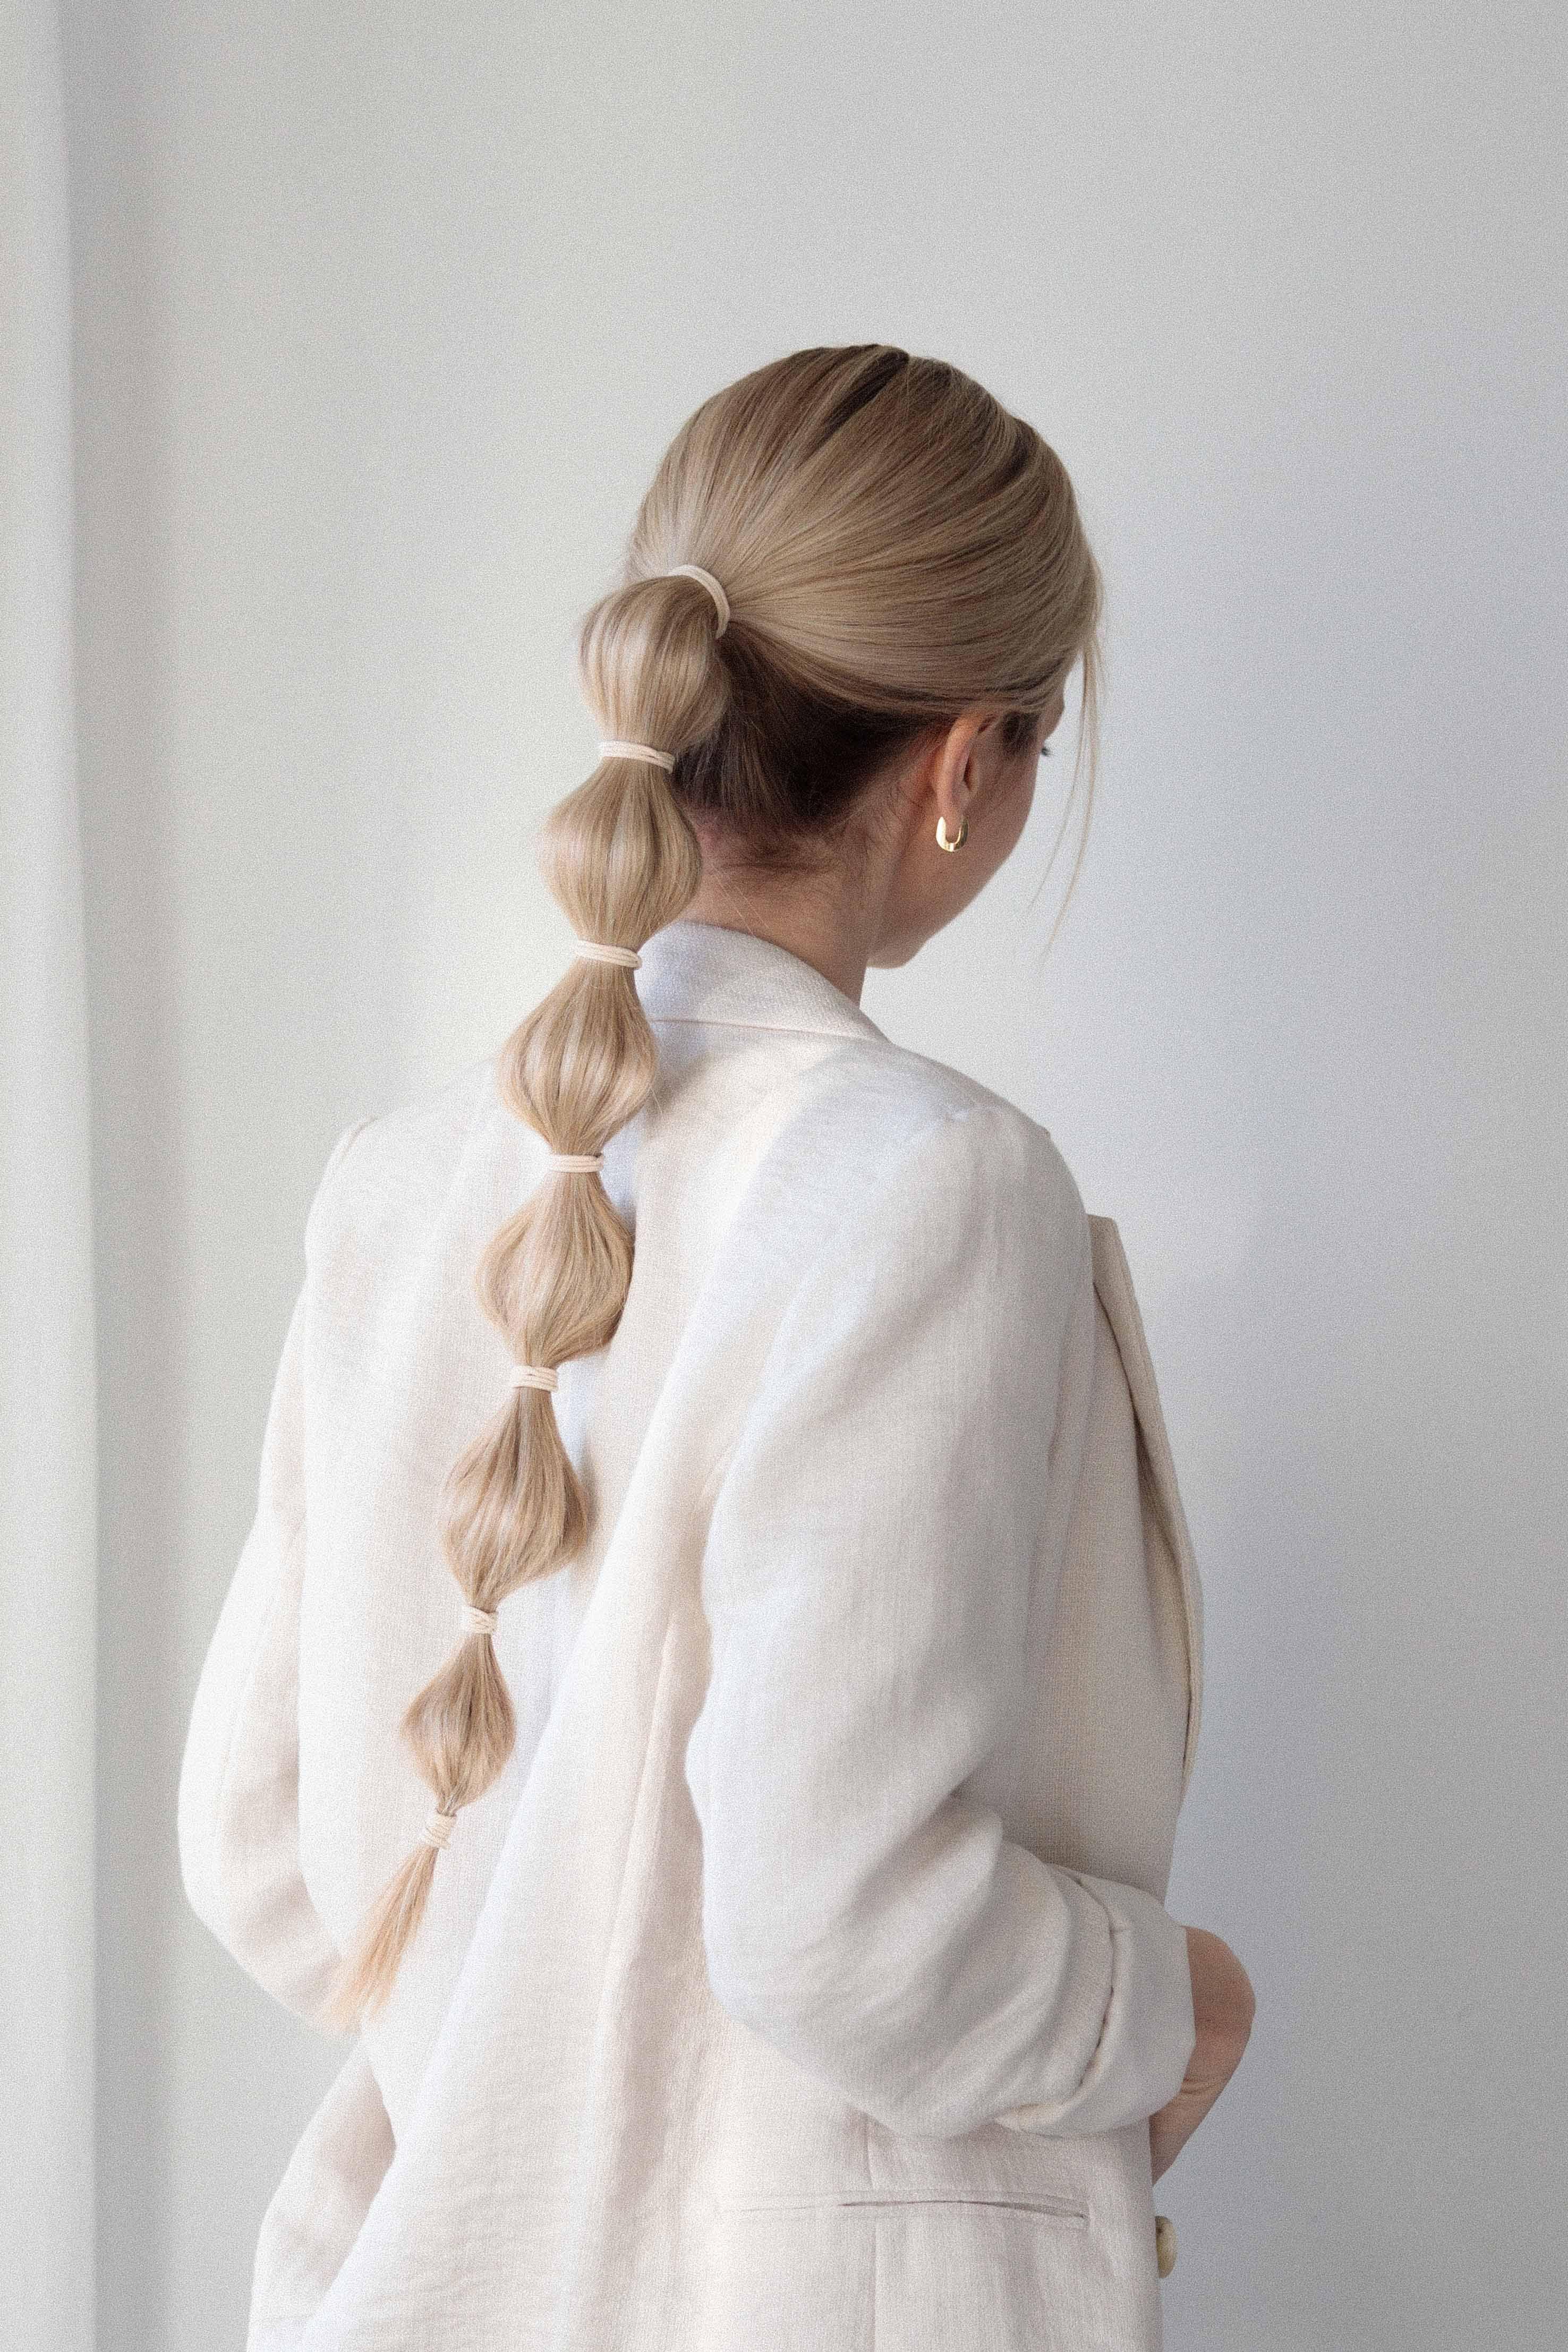 COOL GIRL HAIRSTYLES 2020 😎 EASY HAIRSTYLES FOR LONG HAIR & MEDIUM HAIR   Alex Gaboury Gallery